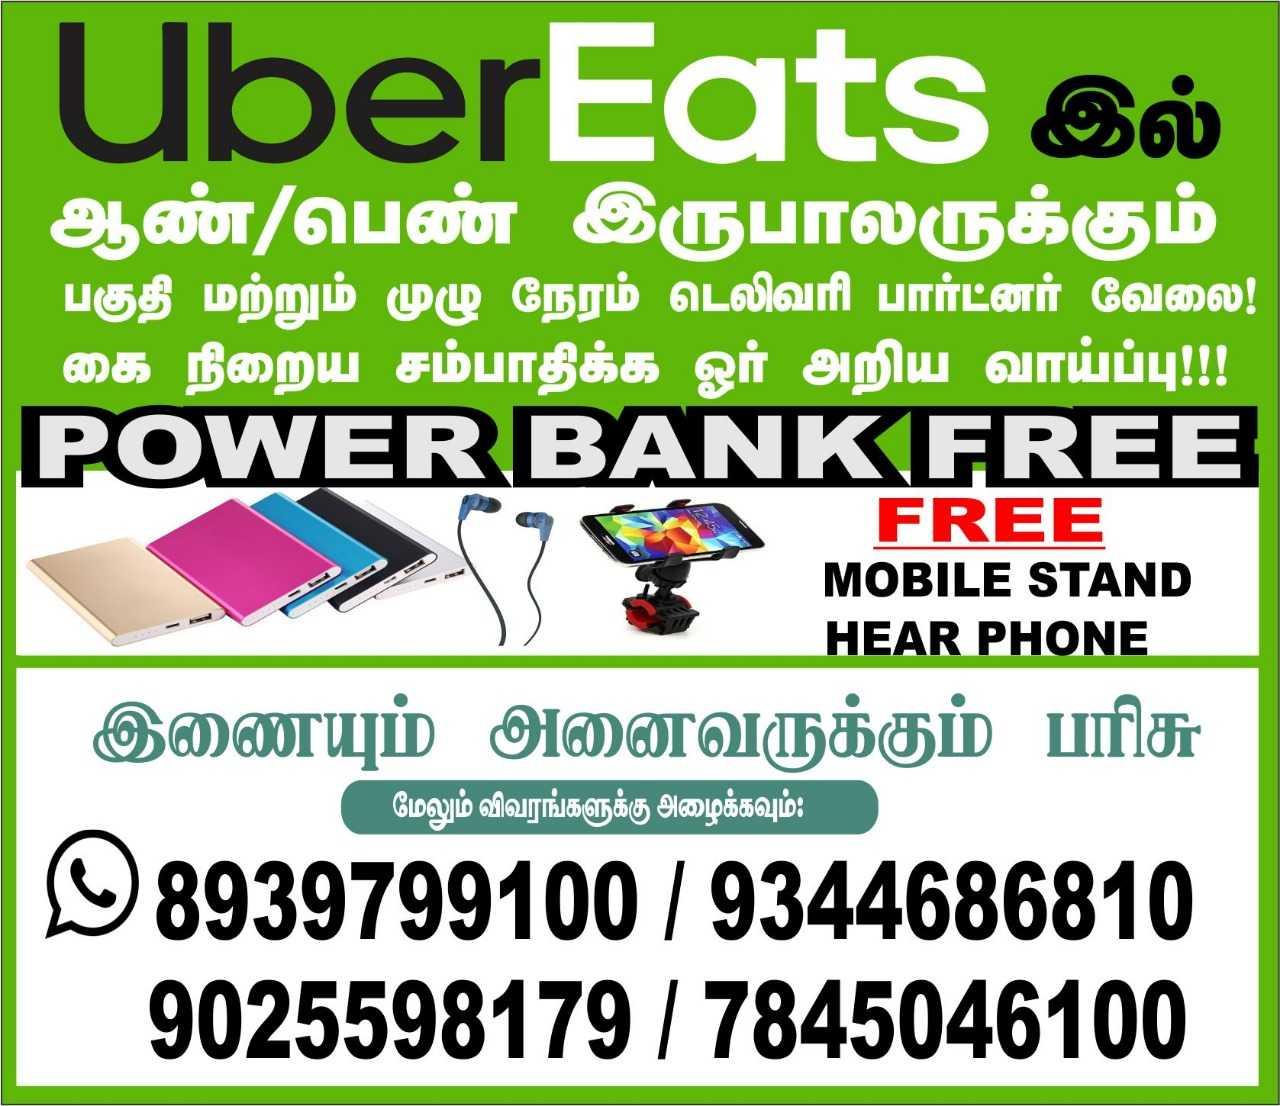 Uber Eats Dost Attachment Center in Arumbakkam, Chennai-600106